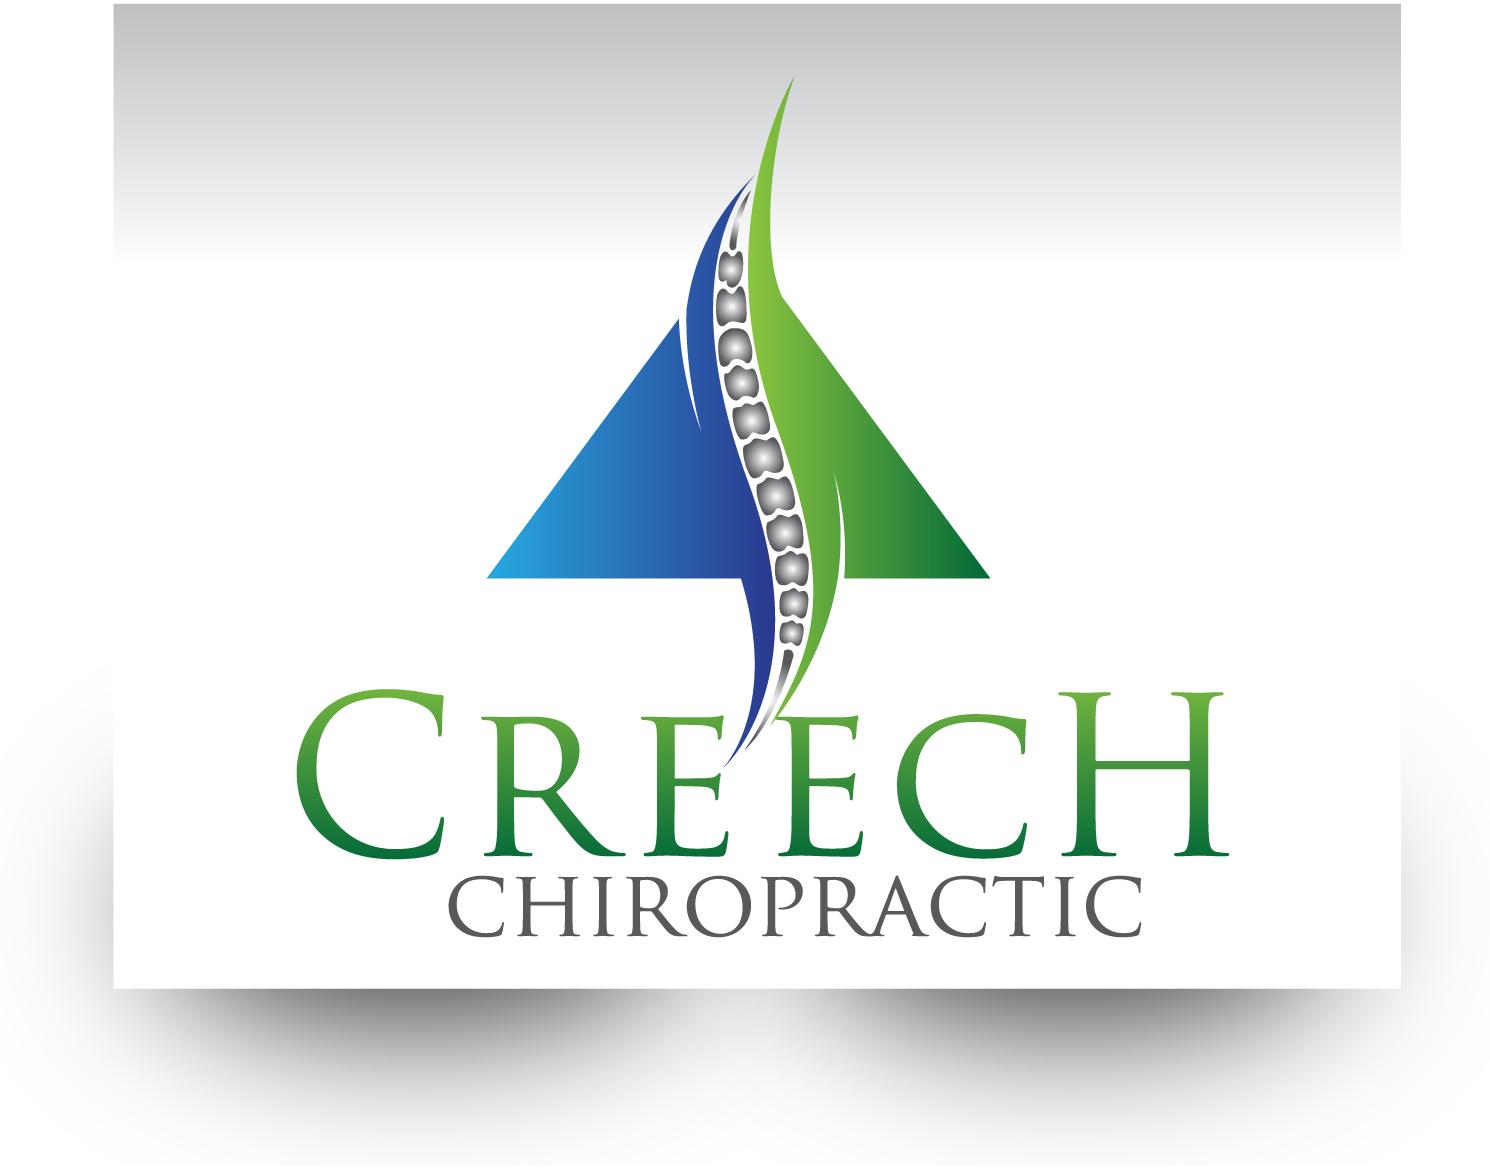 Logo Design by demang - Entry No. 136 in the Logo Design Contest Imaginative Logo Design for Creech Chiropractic.